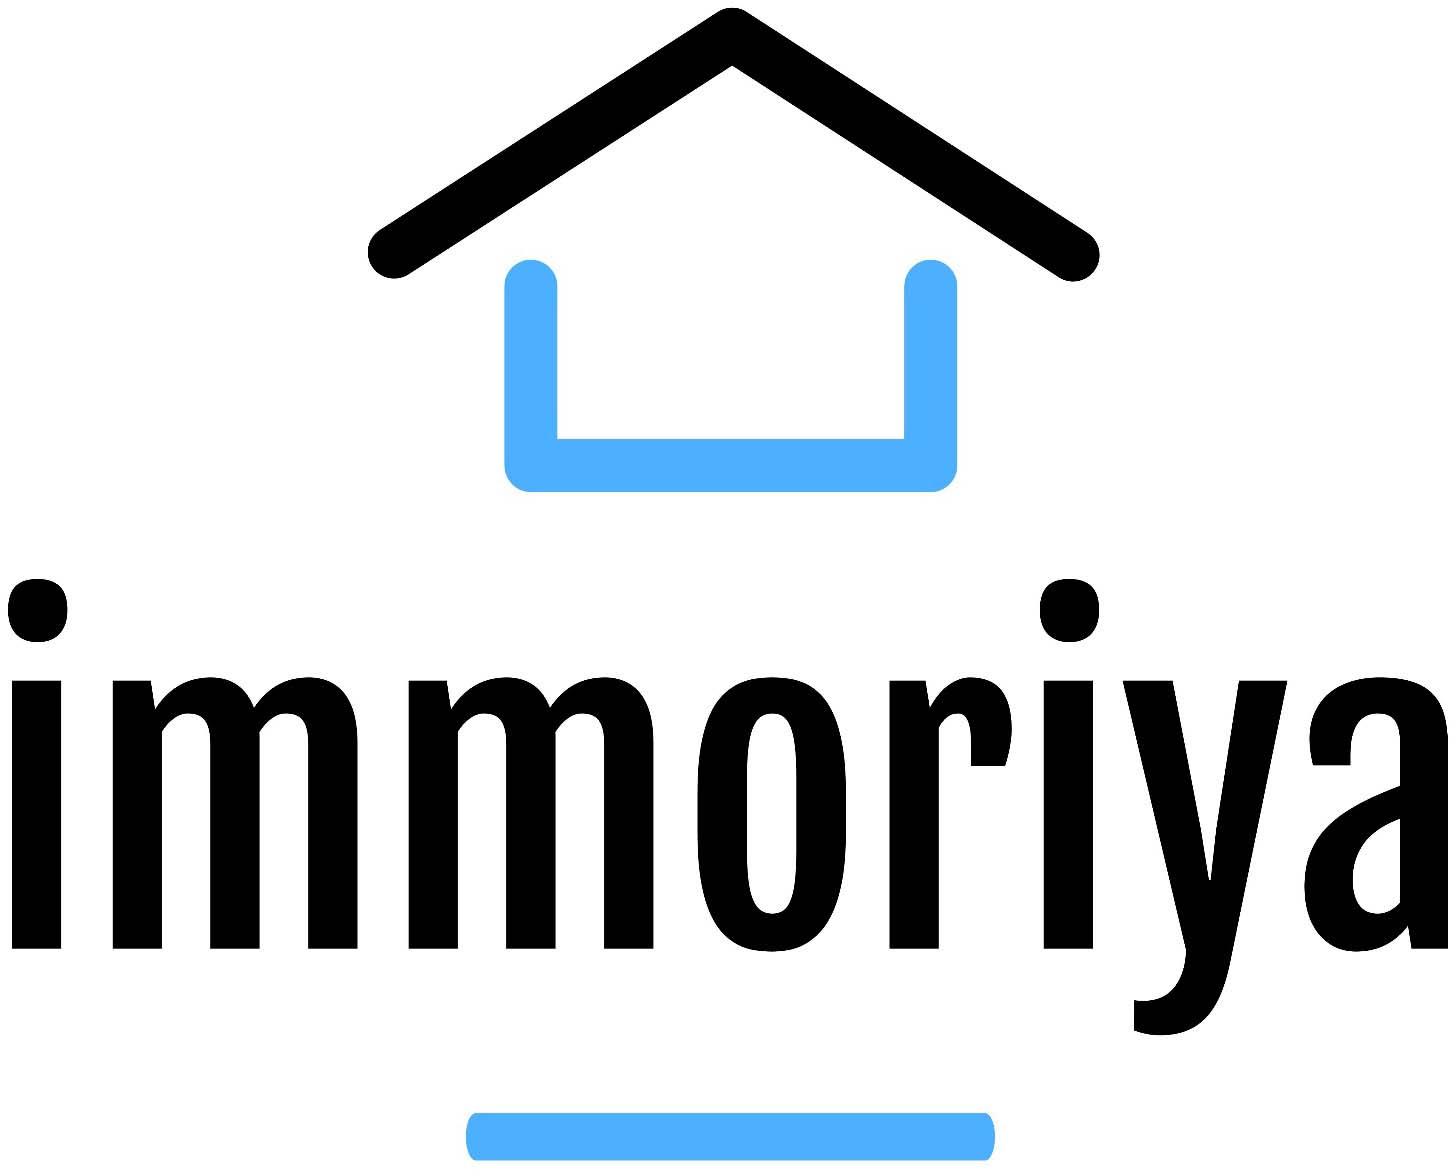 Immoriya